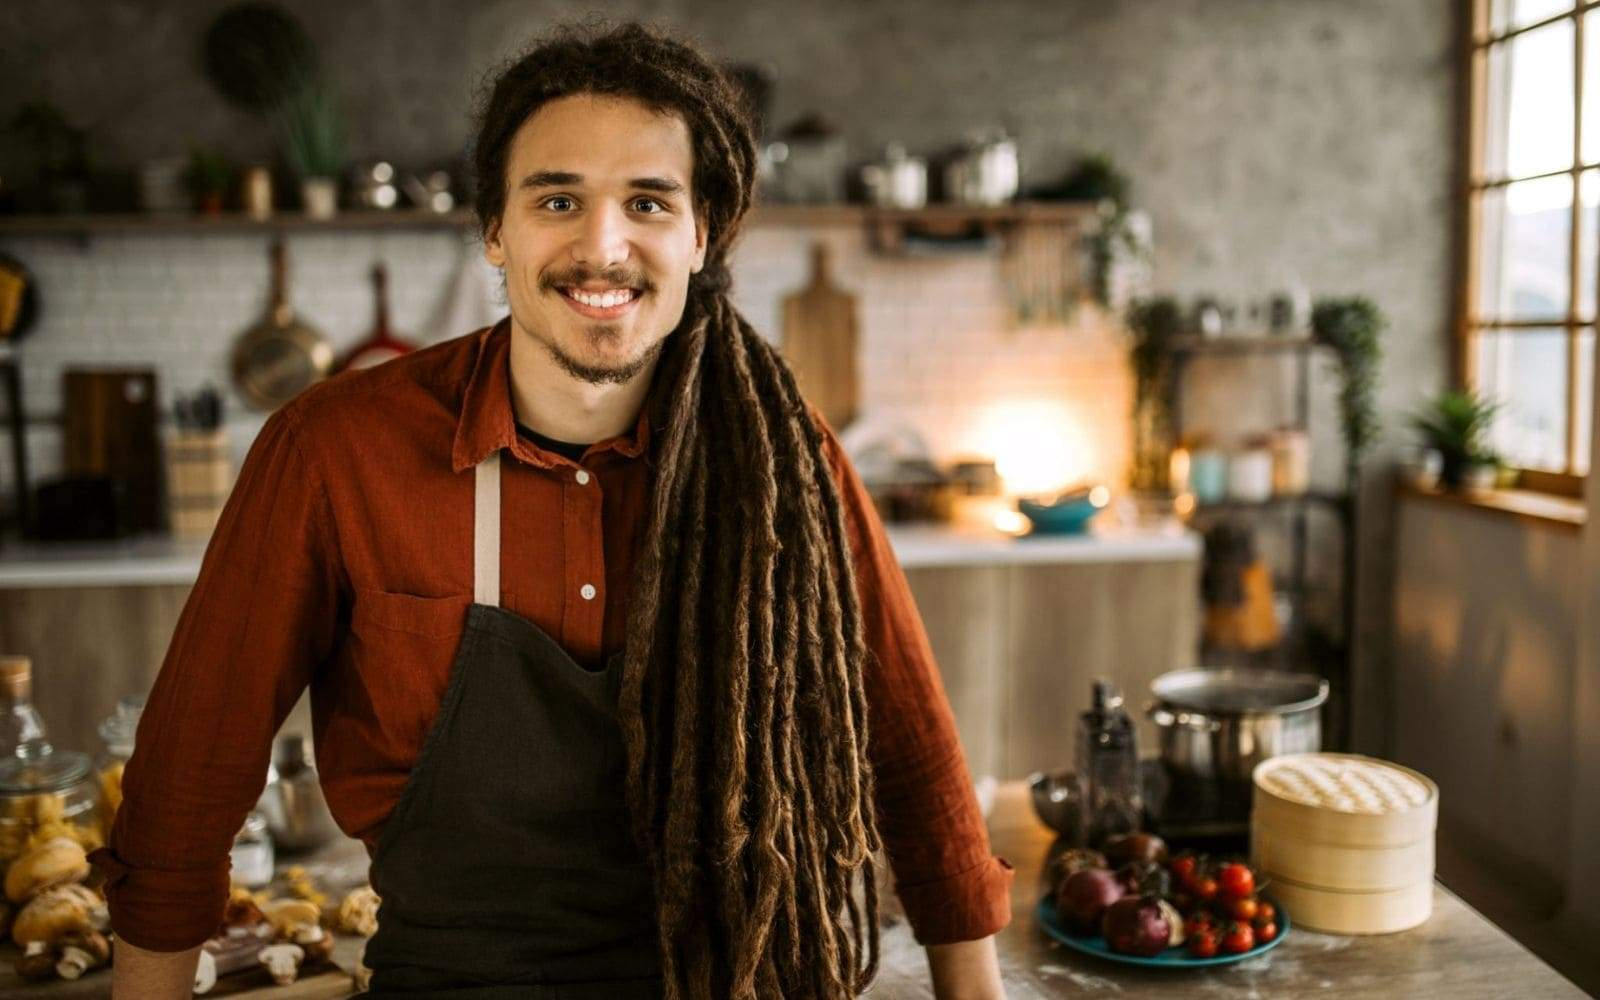 Cuisinier avec dreadlocks souriant assis sur sa table